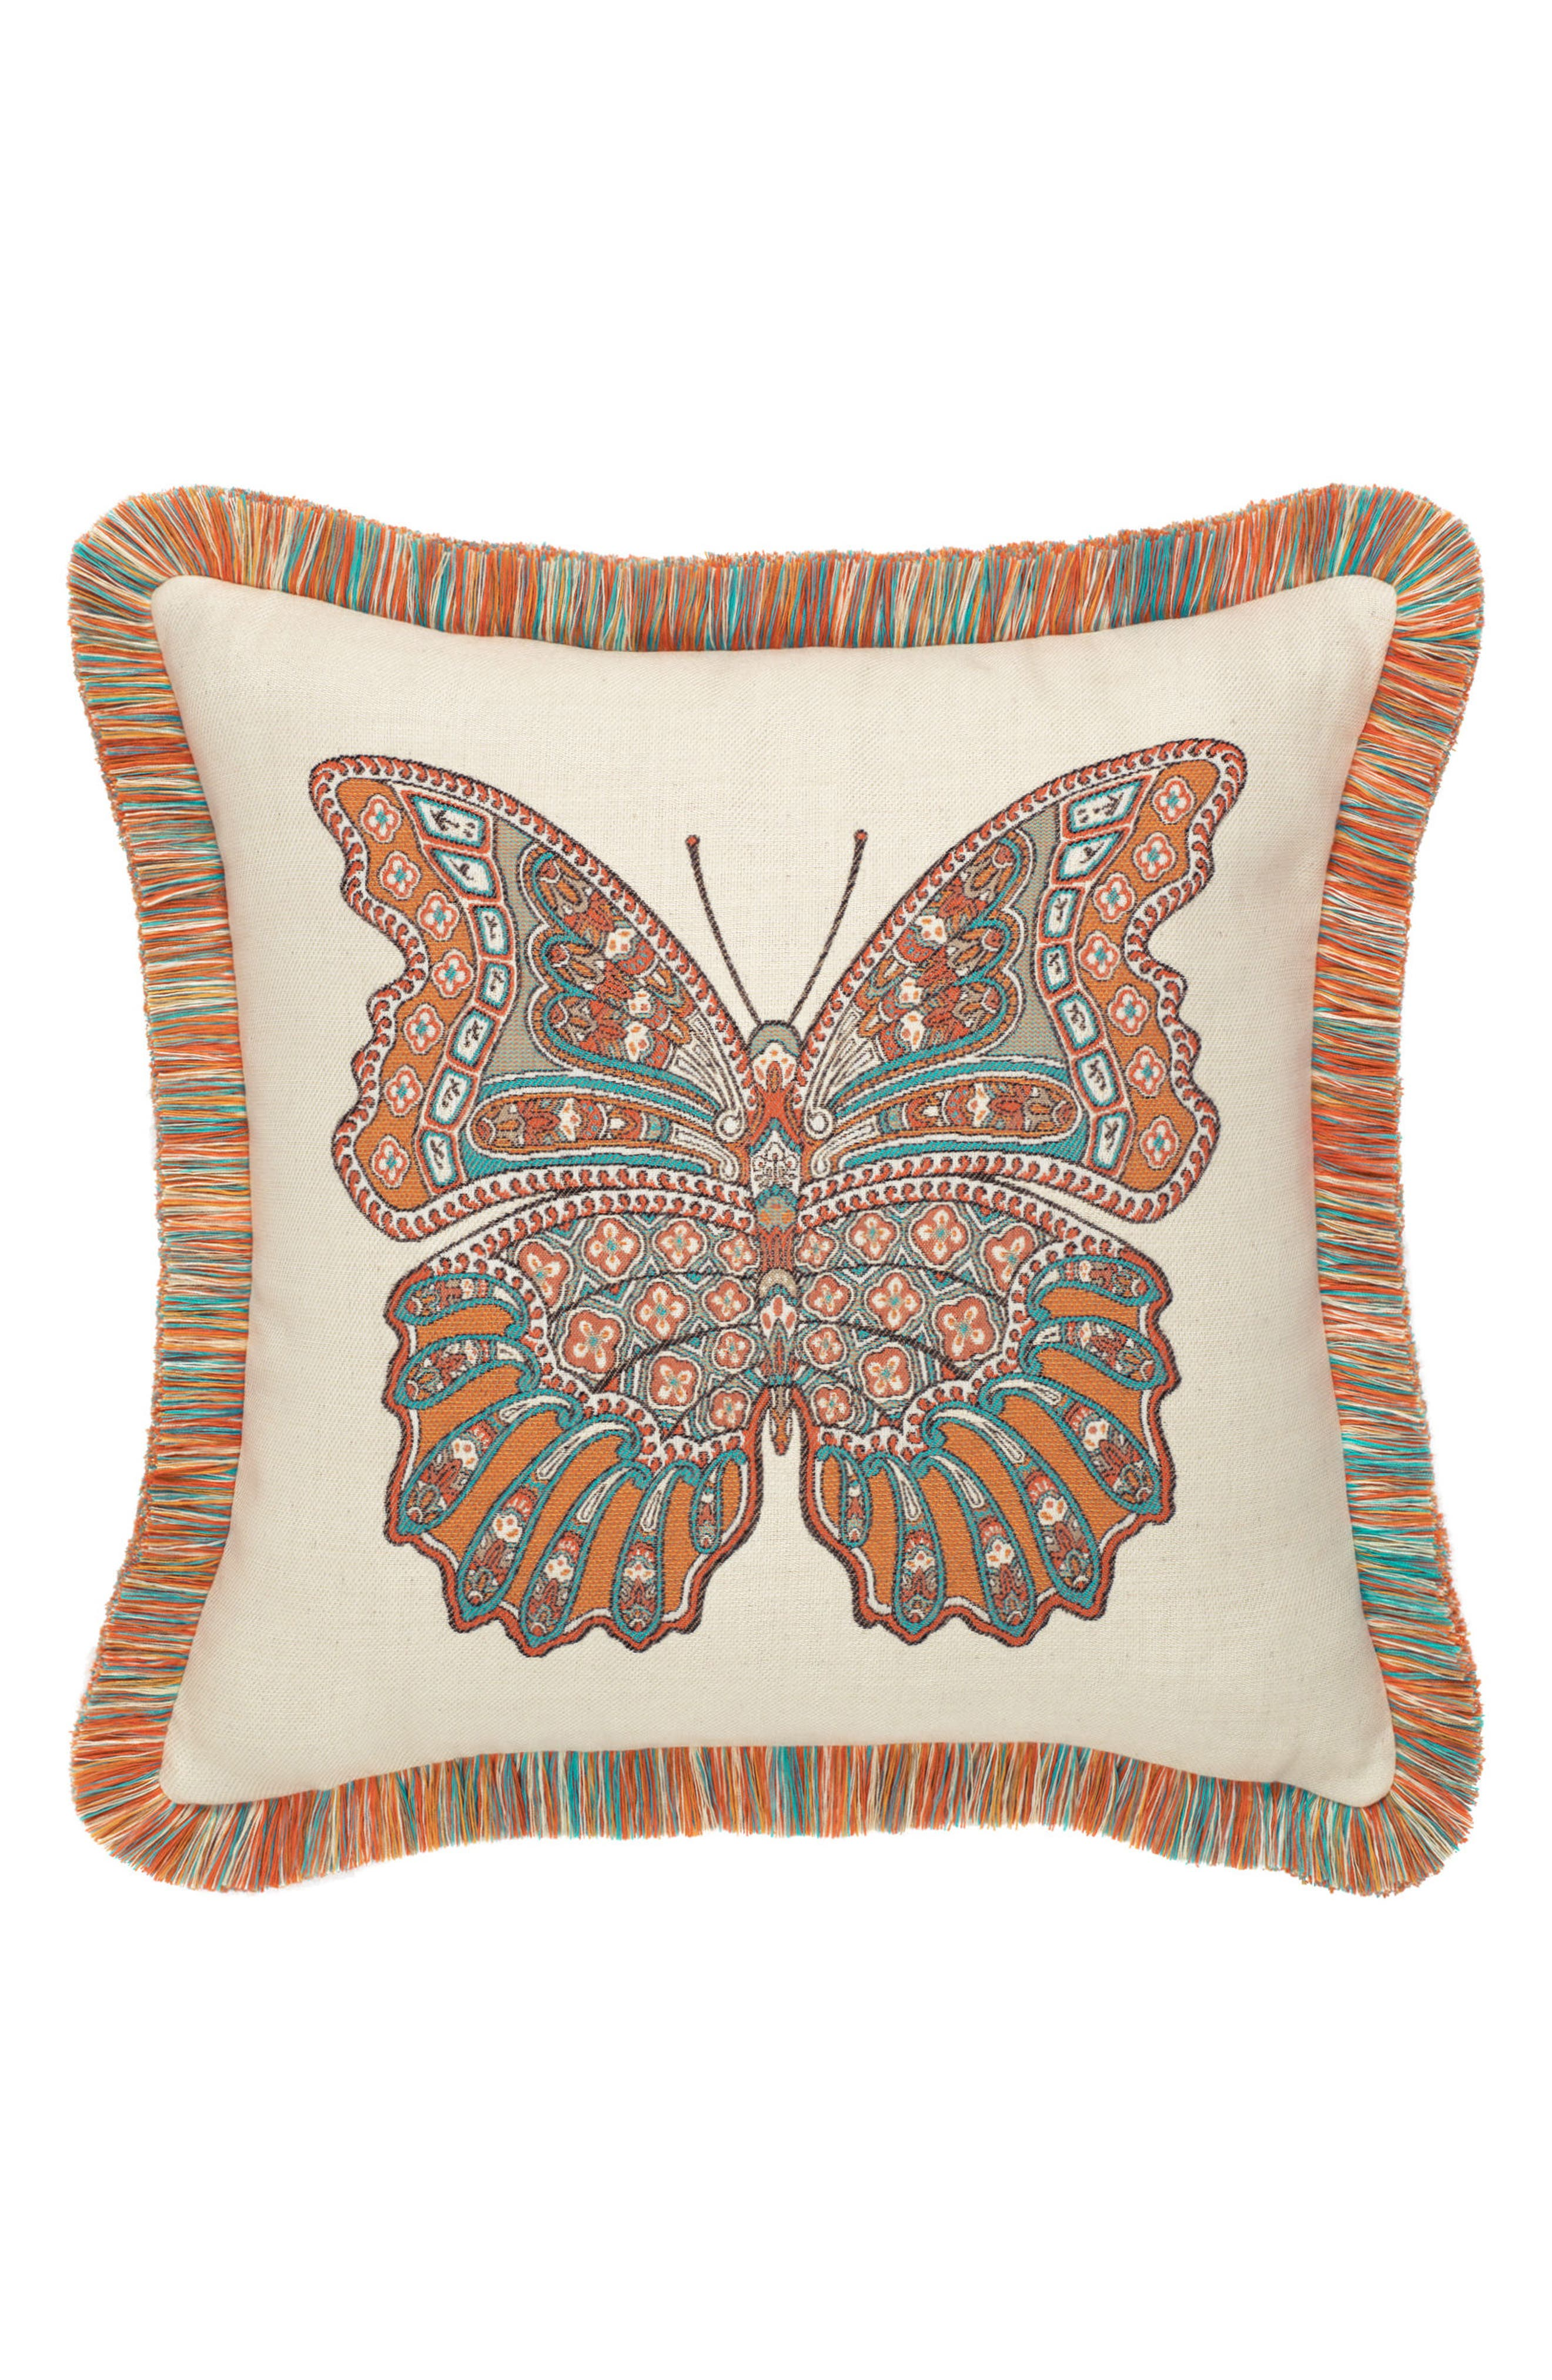 Mariposa Lagoon Indoor/Outdoor Accent Pillow,                         Main,                         color, Orange/ Ivory